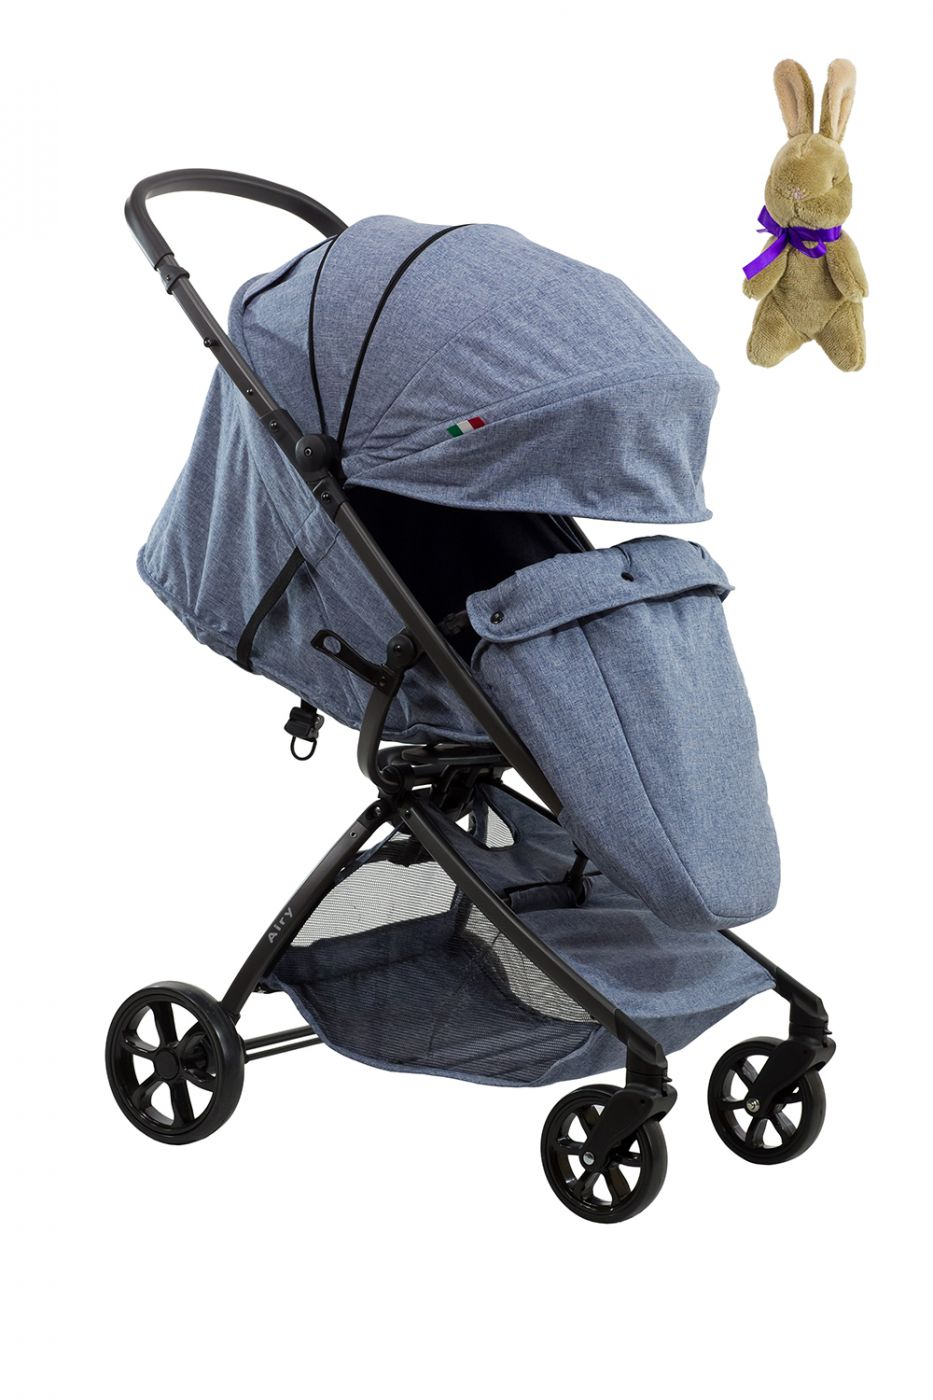 Коляска детская прогулочная Farfello Airy  серо-голубой / GRAY-BLUE